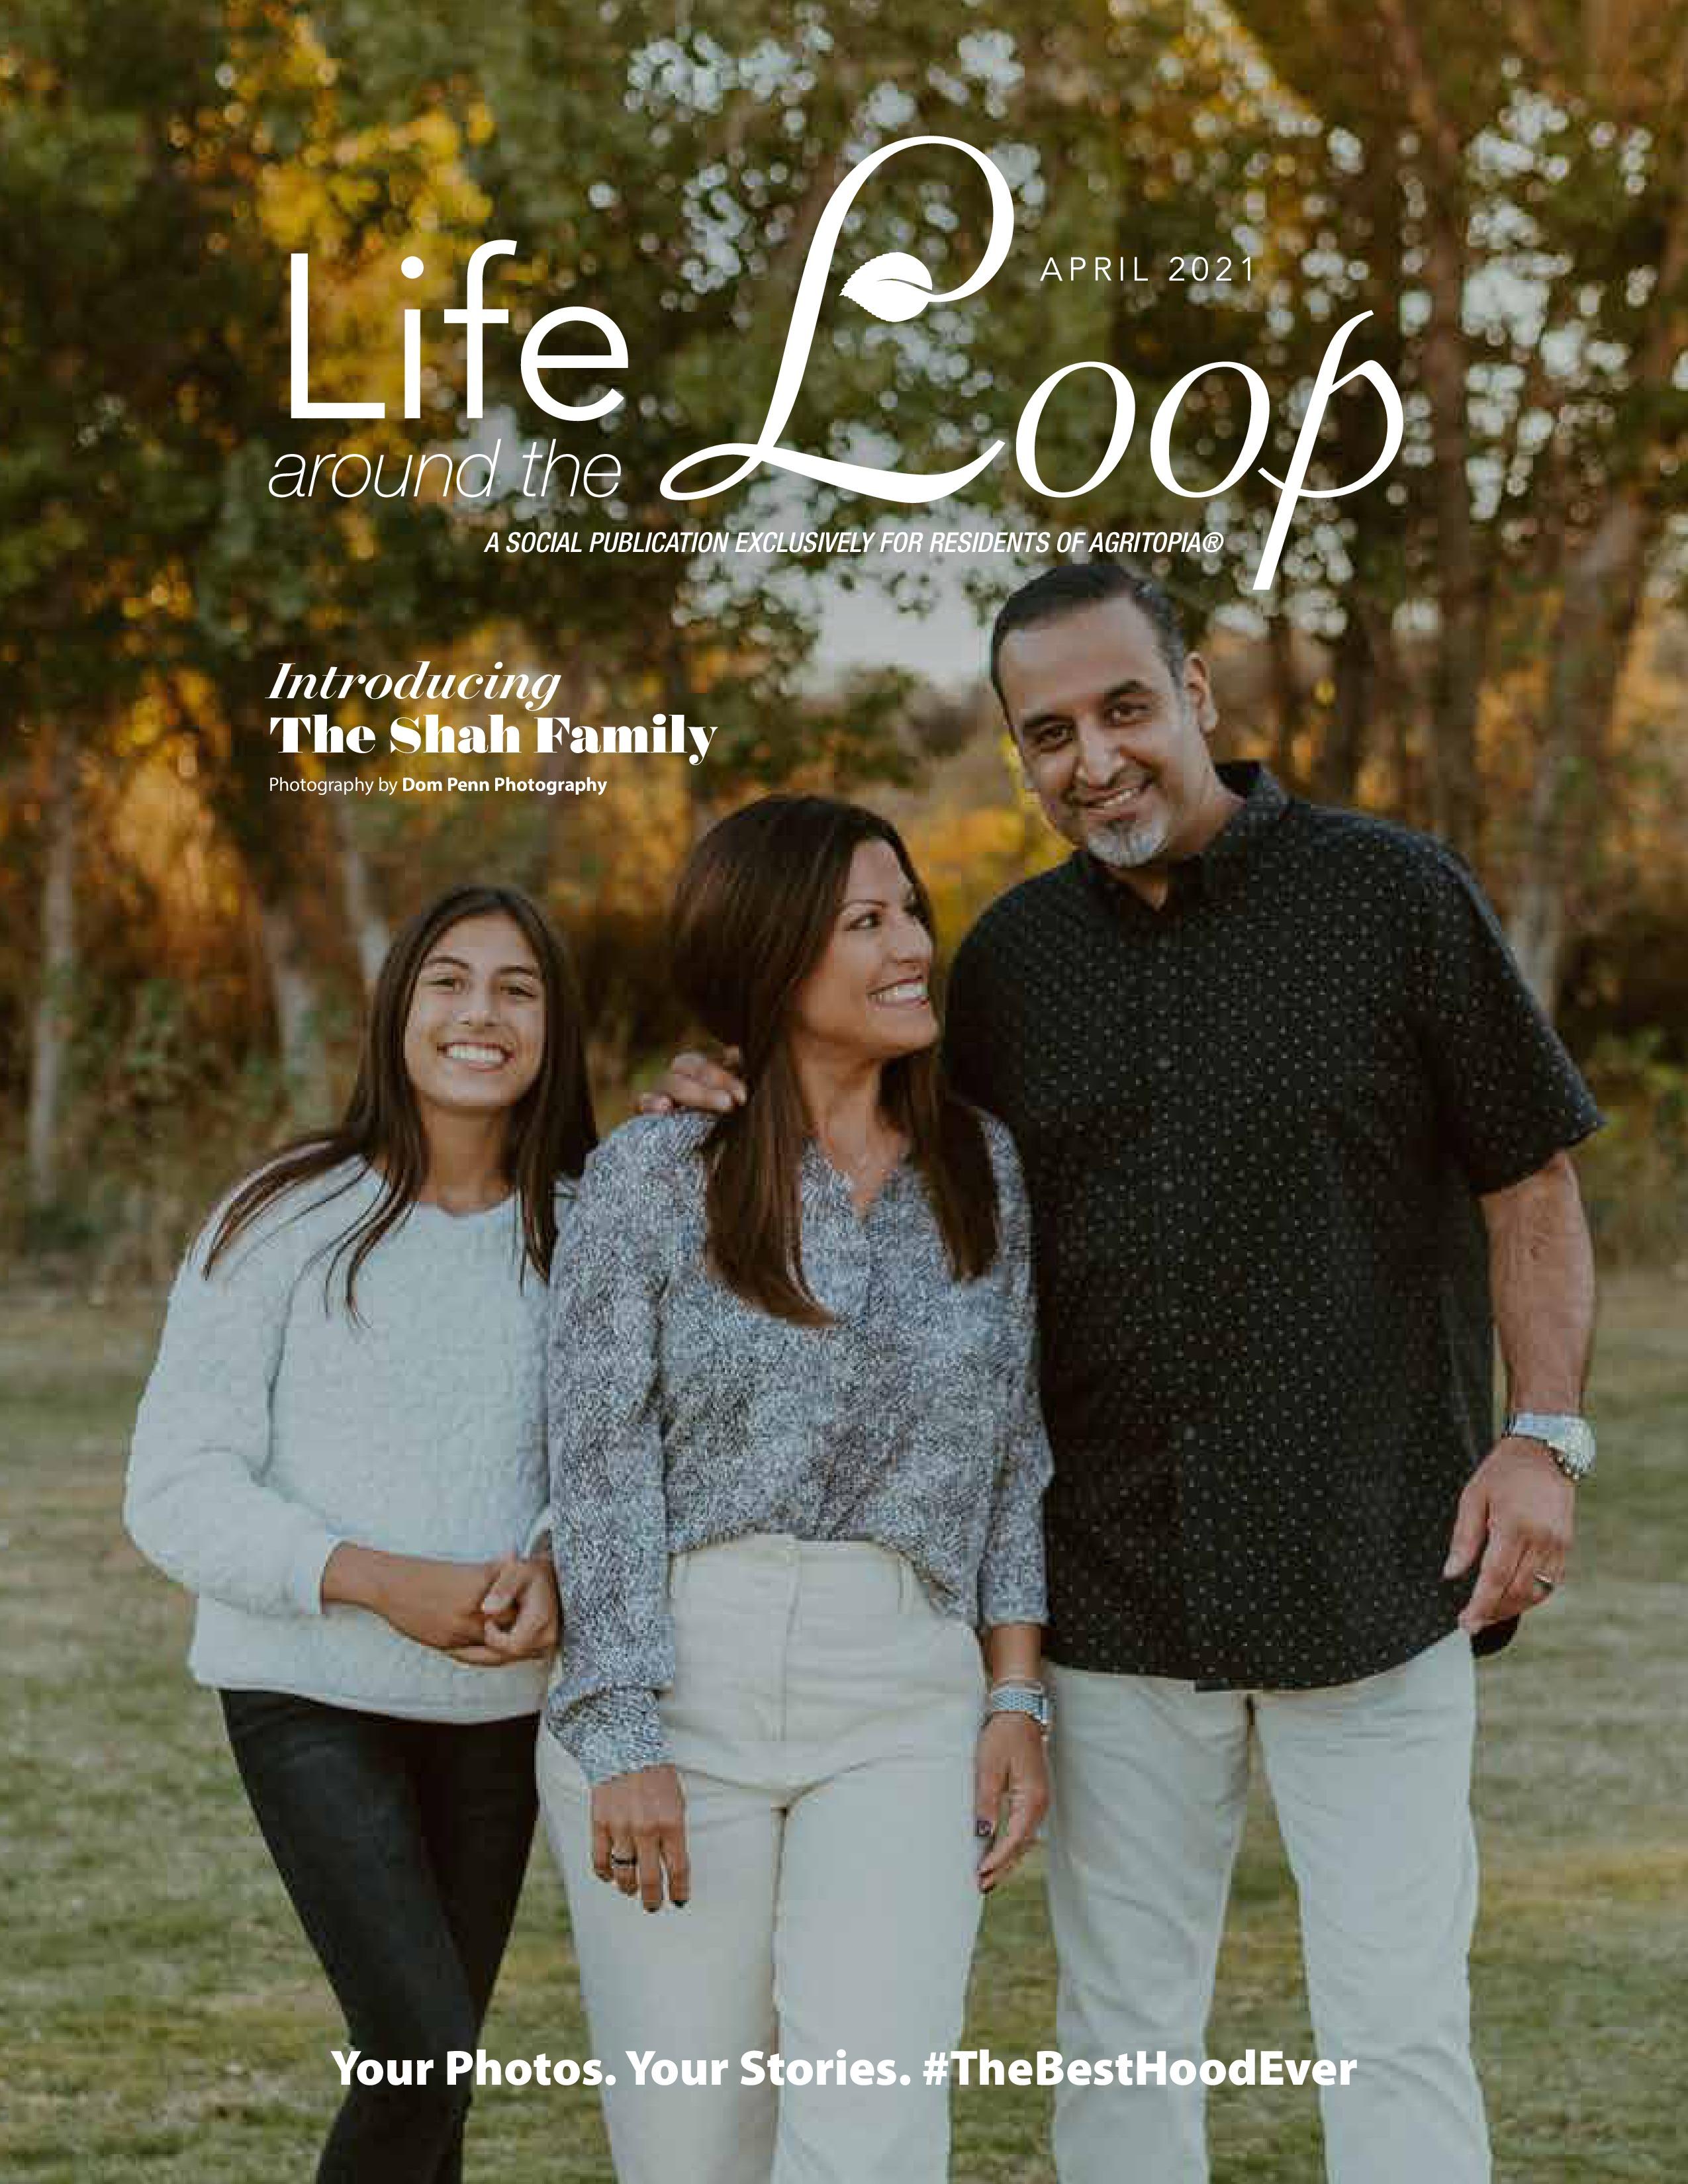 Life Around the Loop 2021-04-01